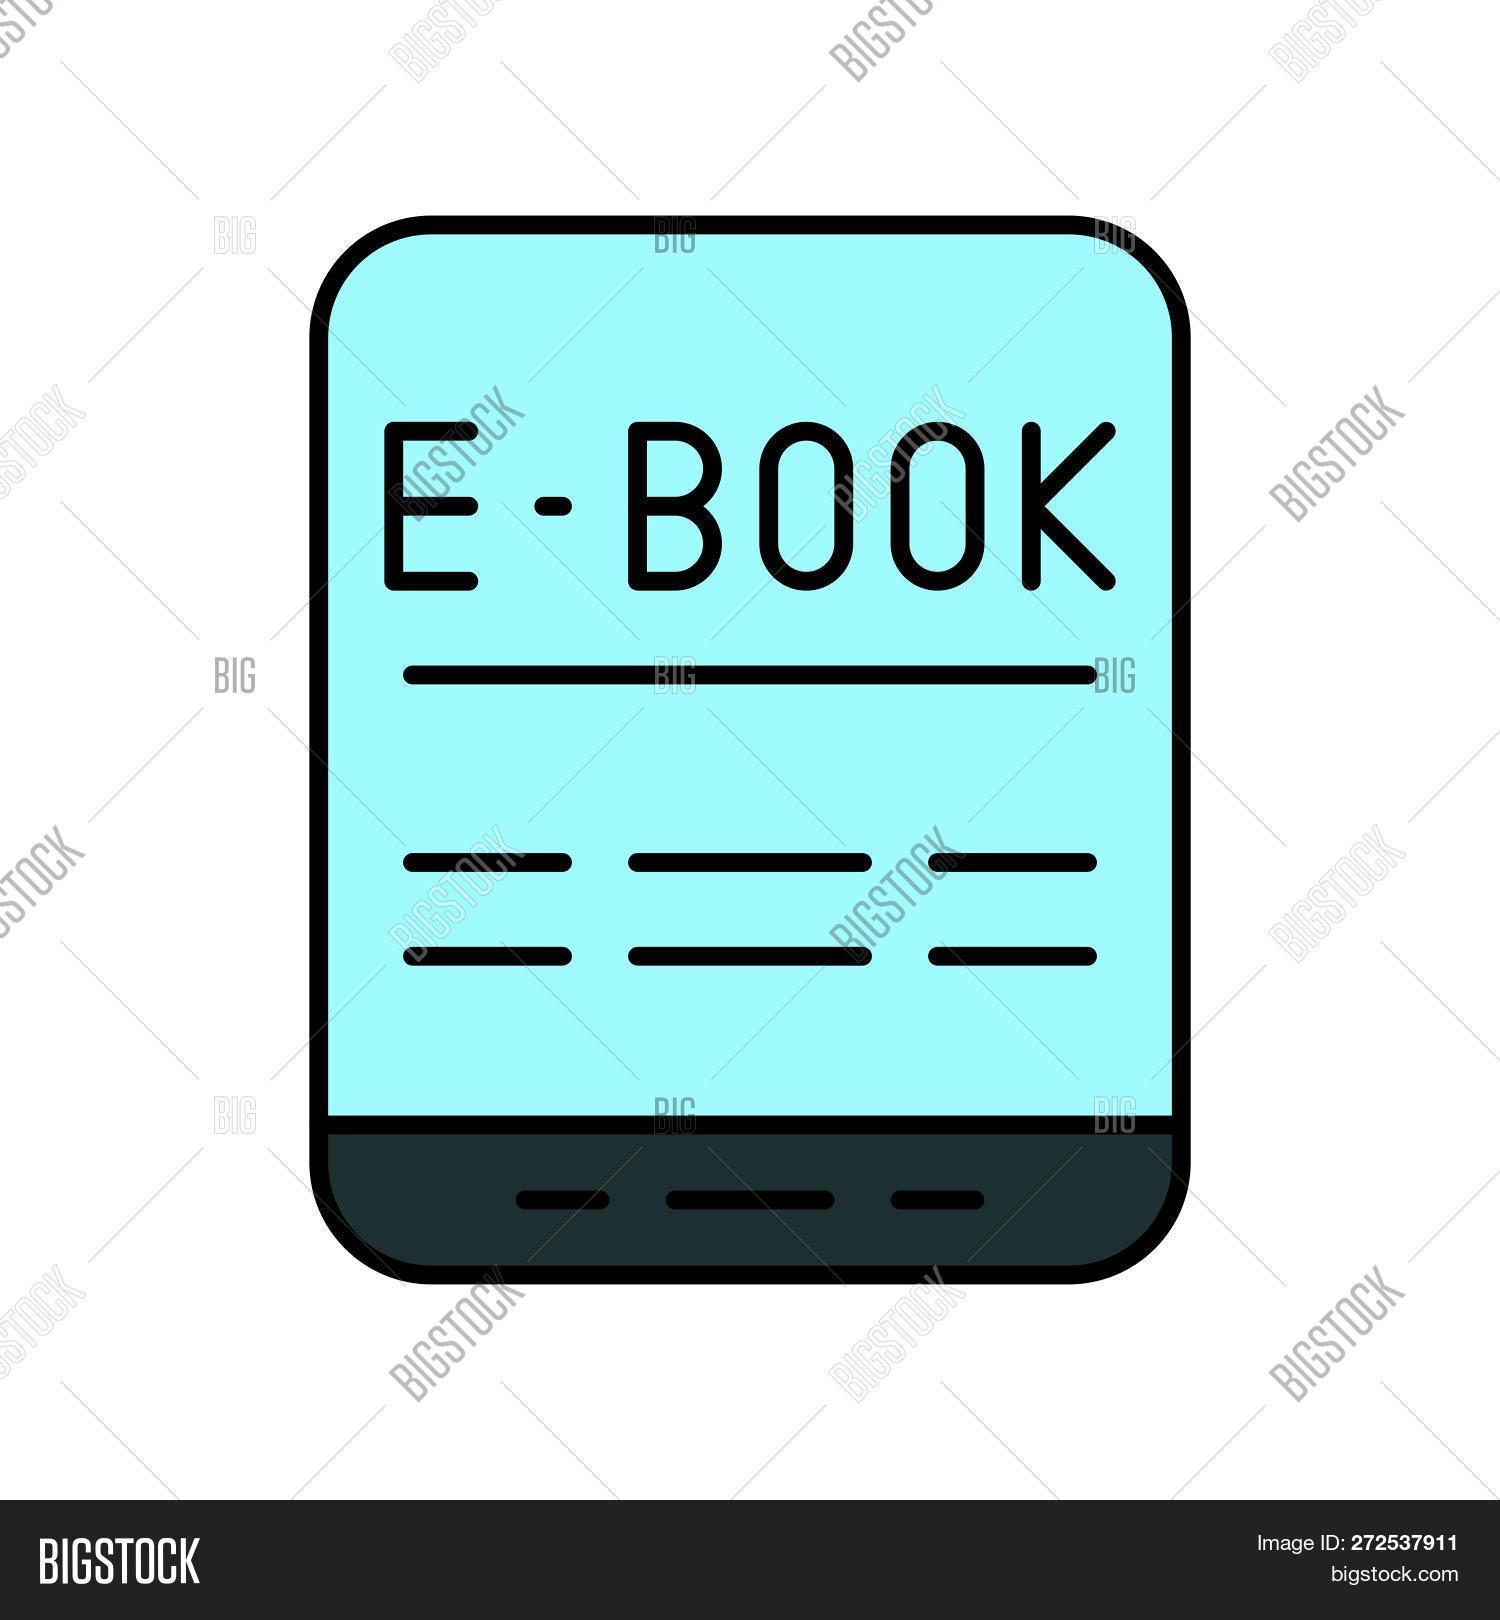 E-book Tablet Device Vector & Photo (Free Trial) | Bigstock